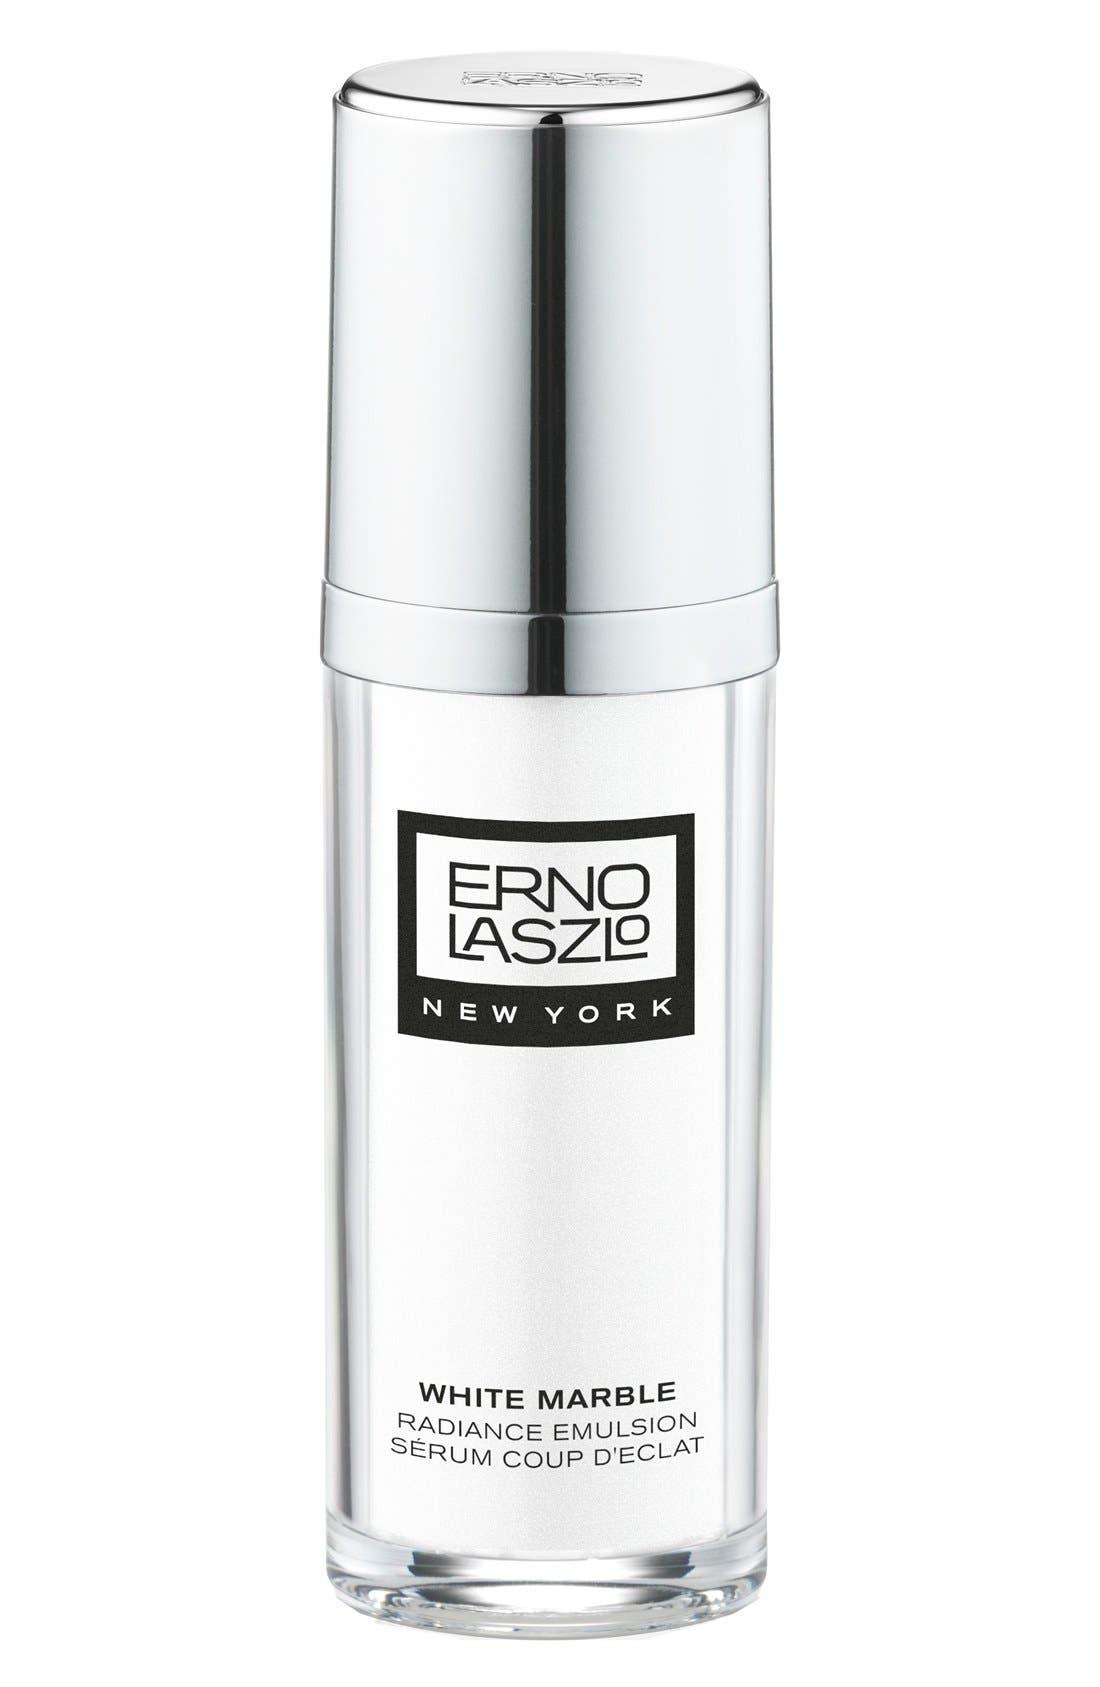 Erno Laszlo 'White Marble' Radiance Emulsion